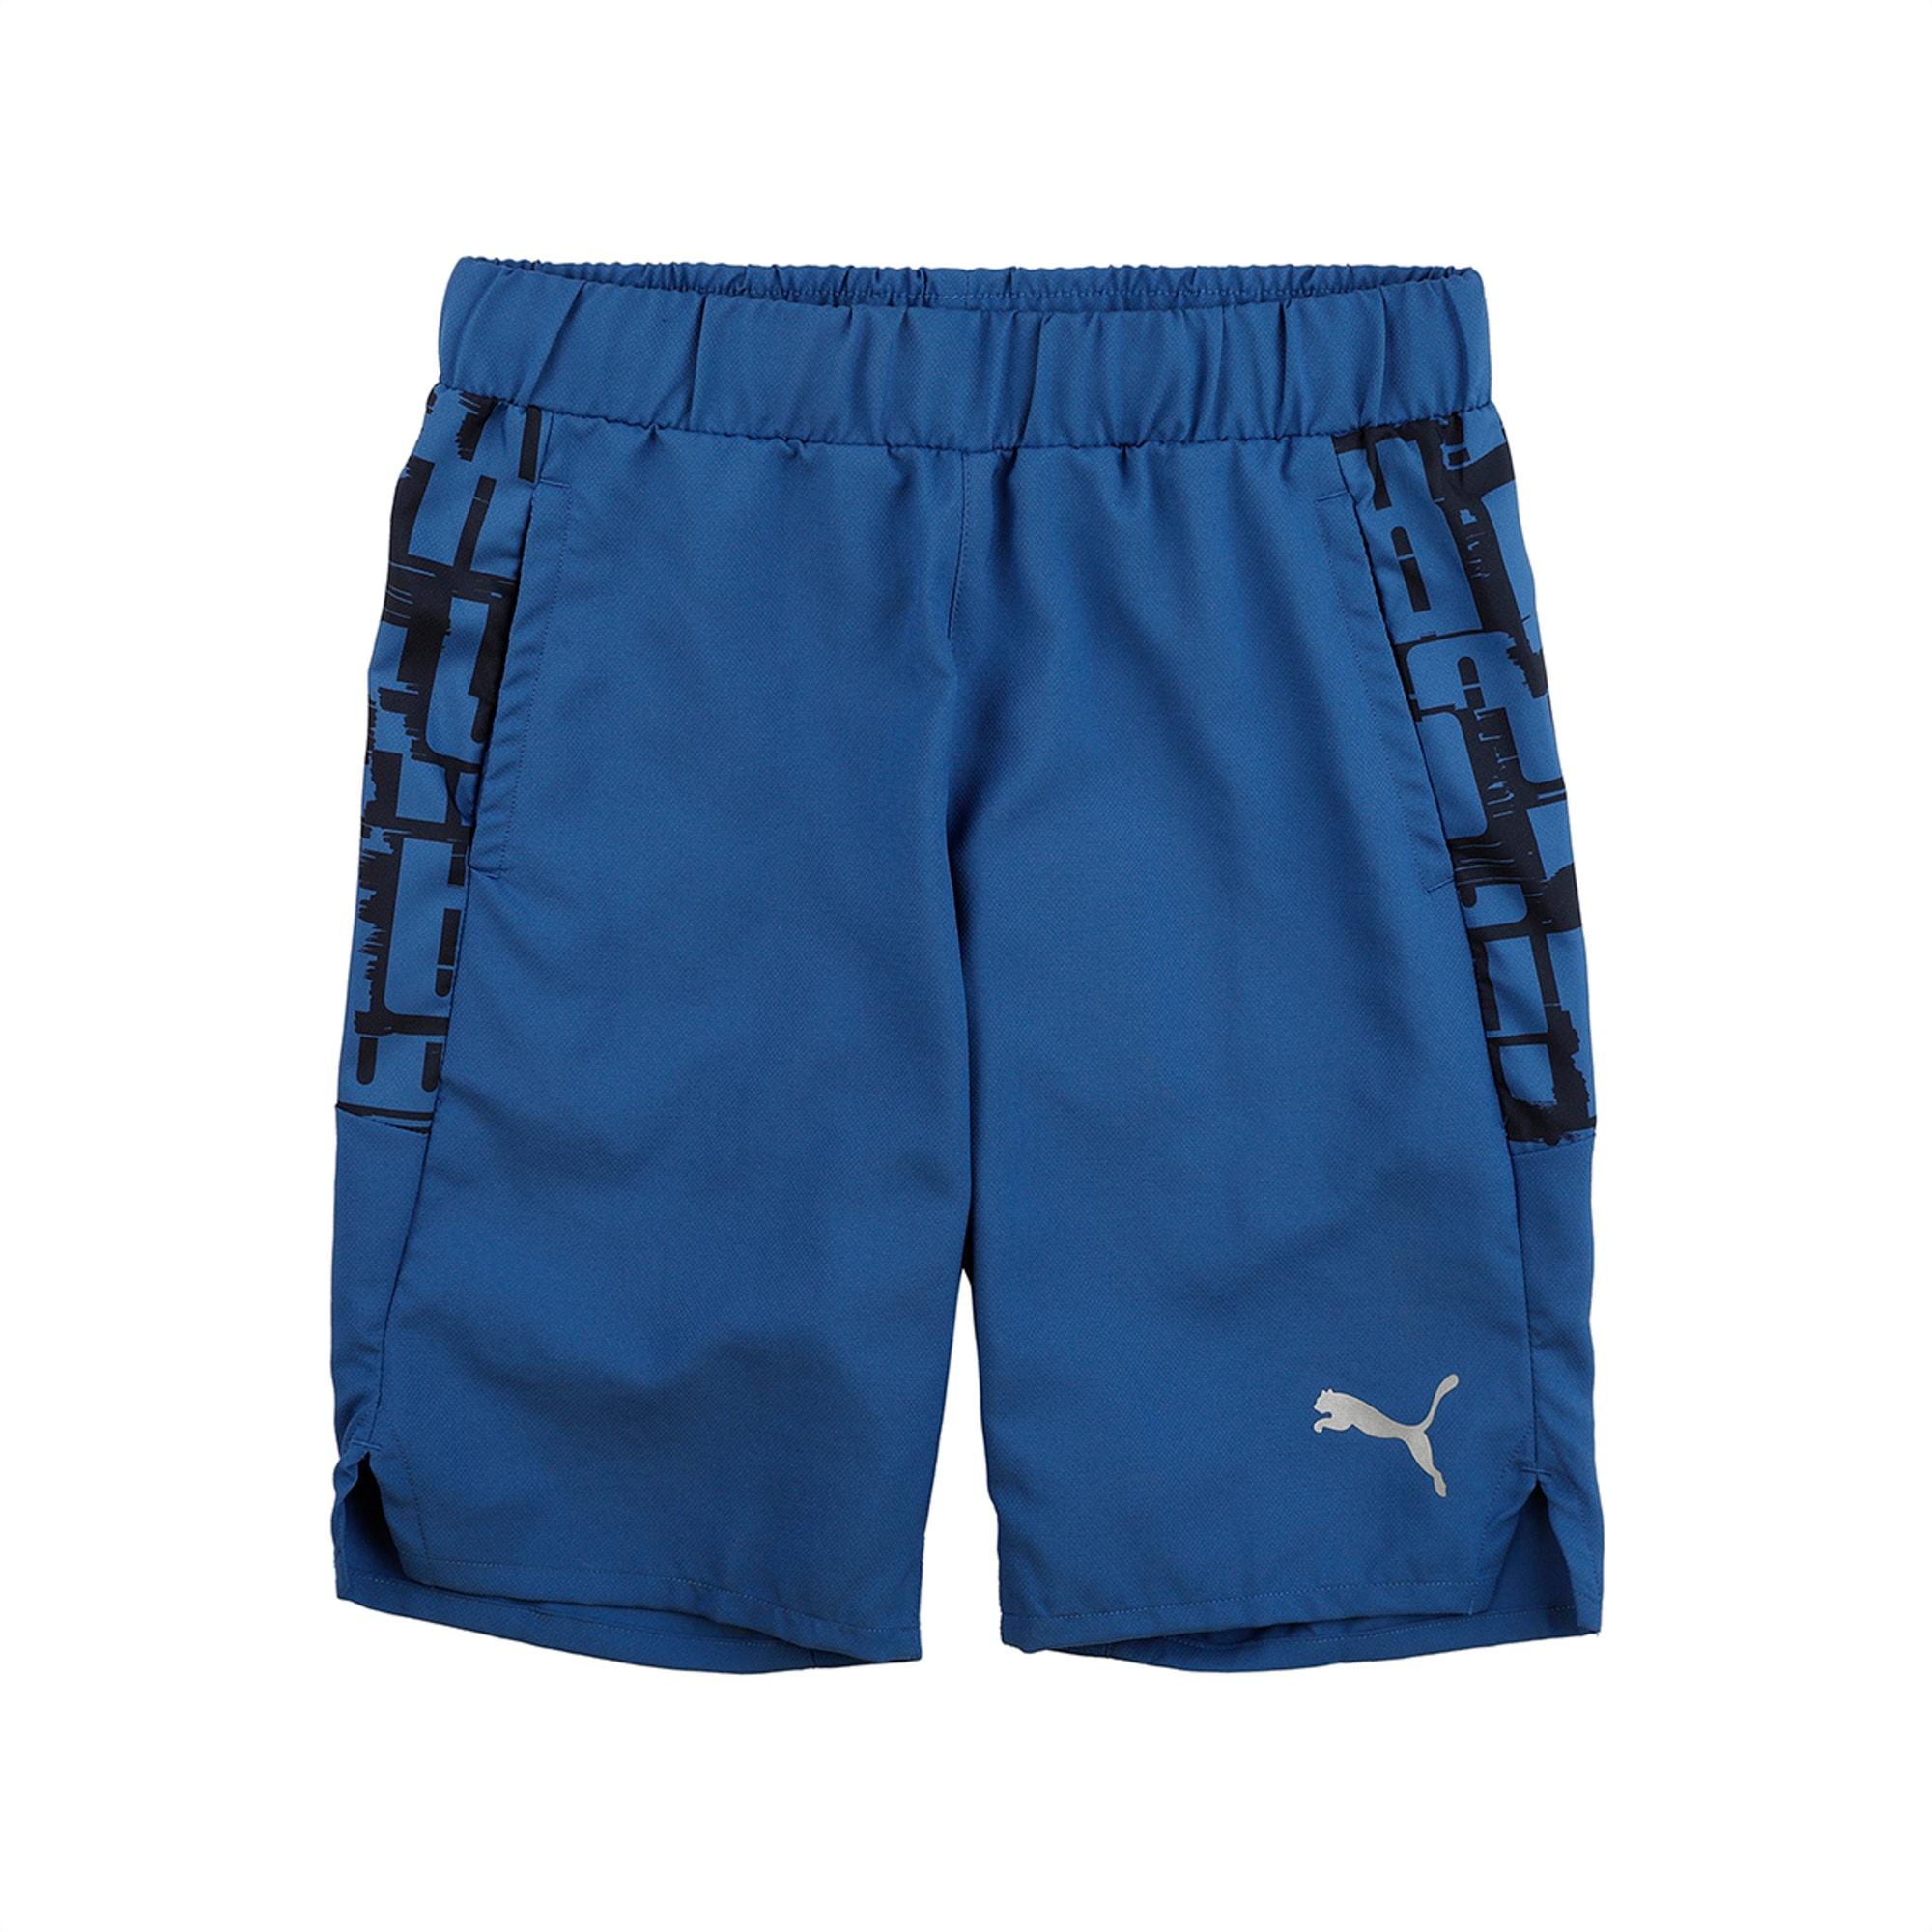 Active Sports Woven Boys' Shorts | Galaxy Blue | PUMA Shoes | PUMA